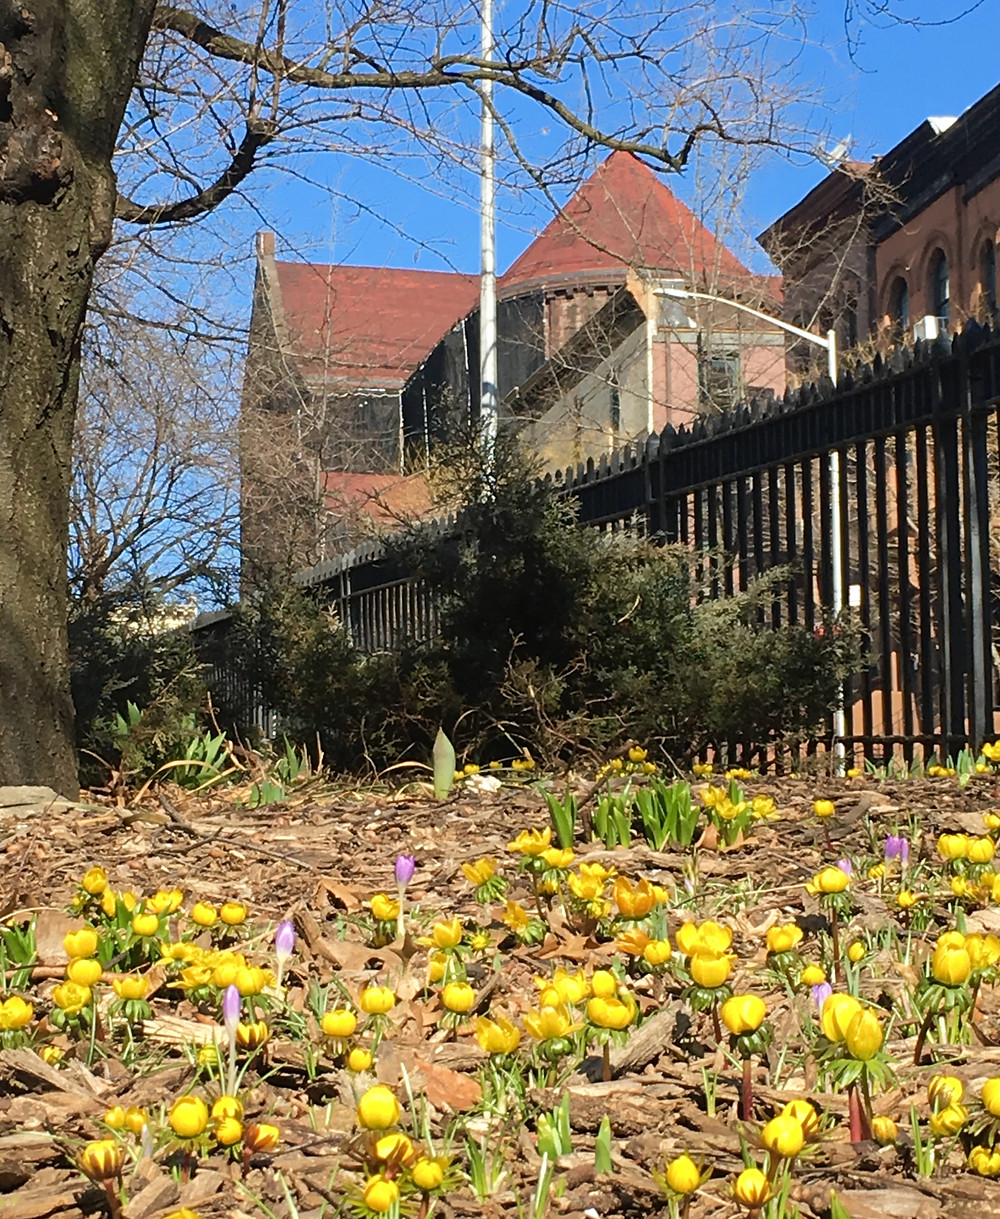 Spring flowers at St. Nicholas Park in Harlem